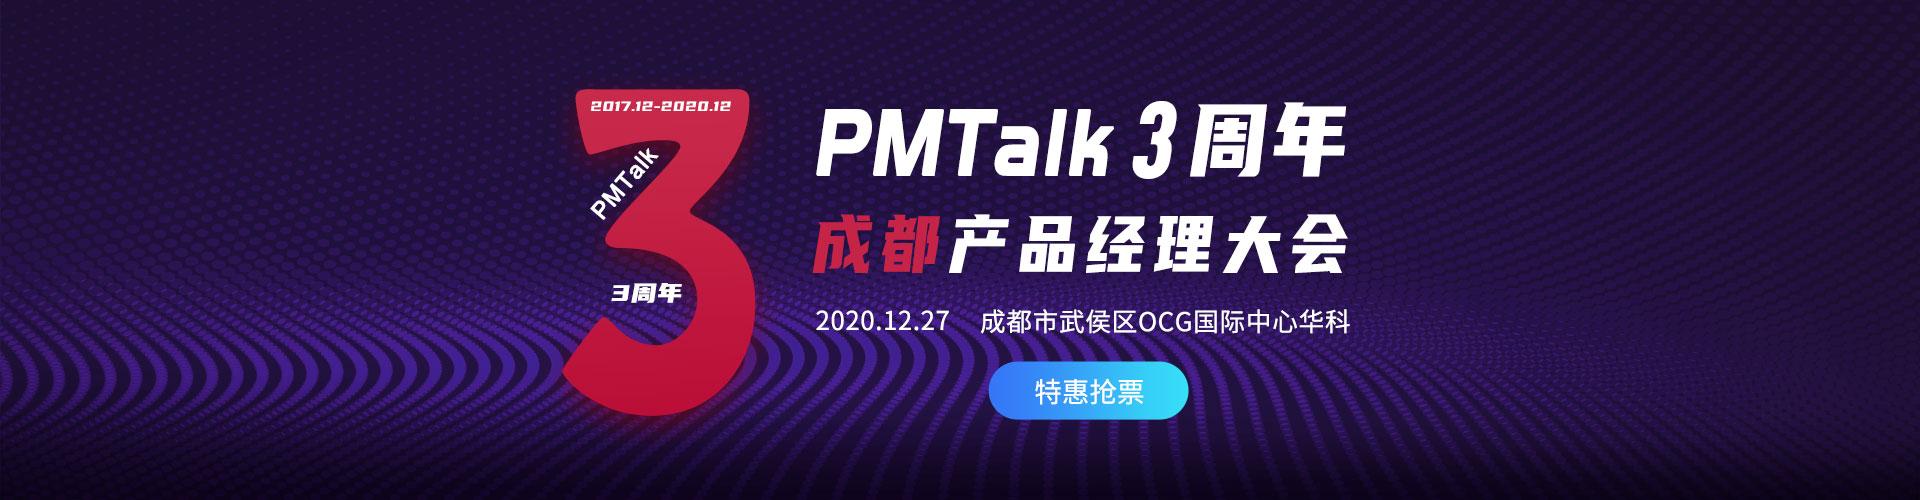 PMTalk3周年全国产品经理大会-成都站